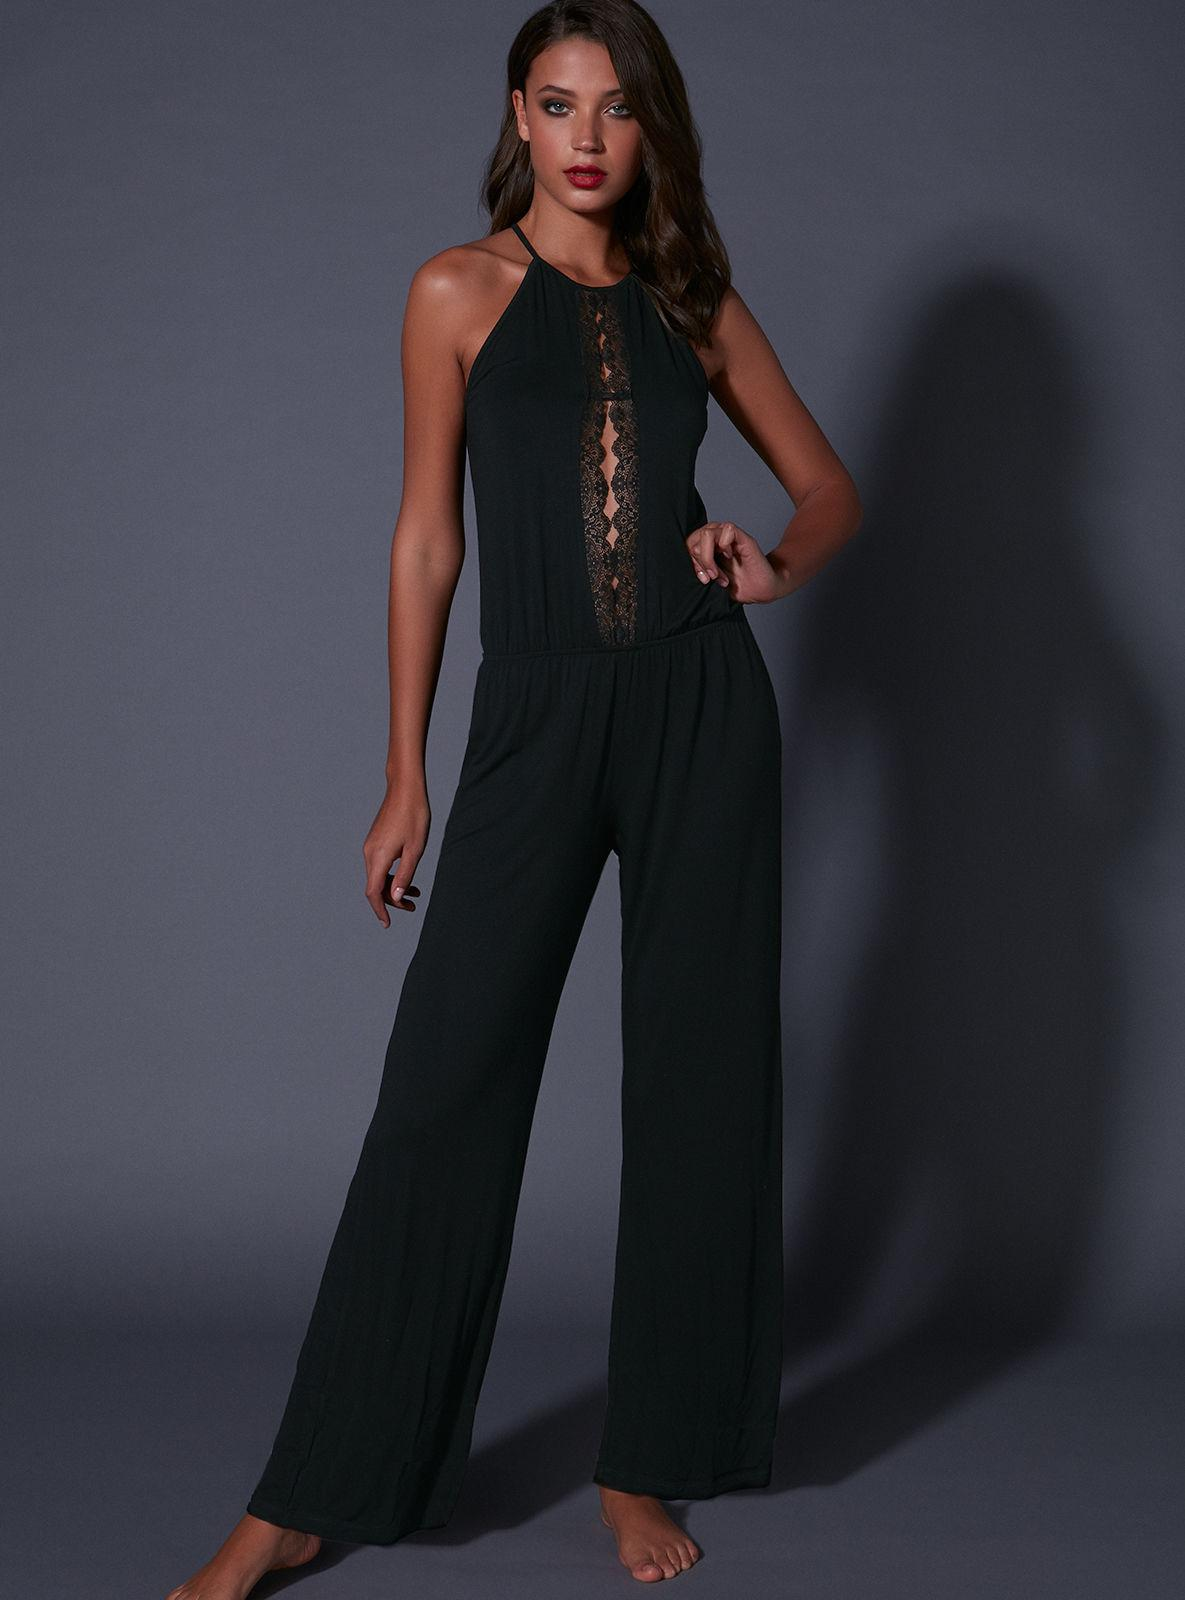 c0d88eb93f5 Lyst - Boux Avenue Rene Keyhole Jumpsuit in Black